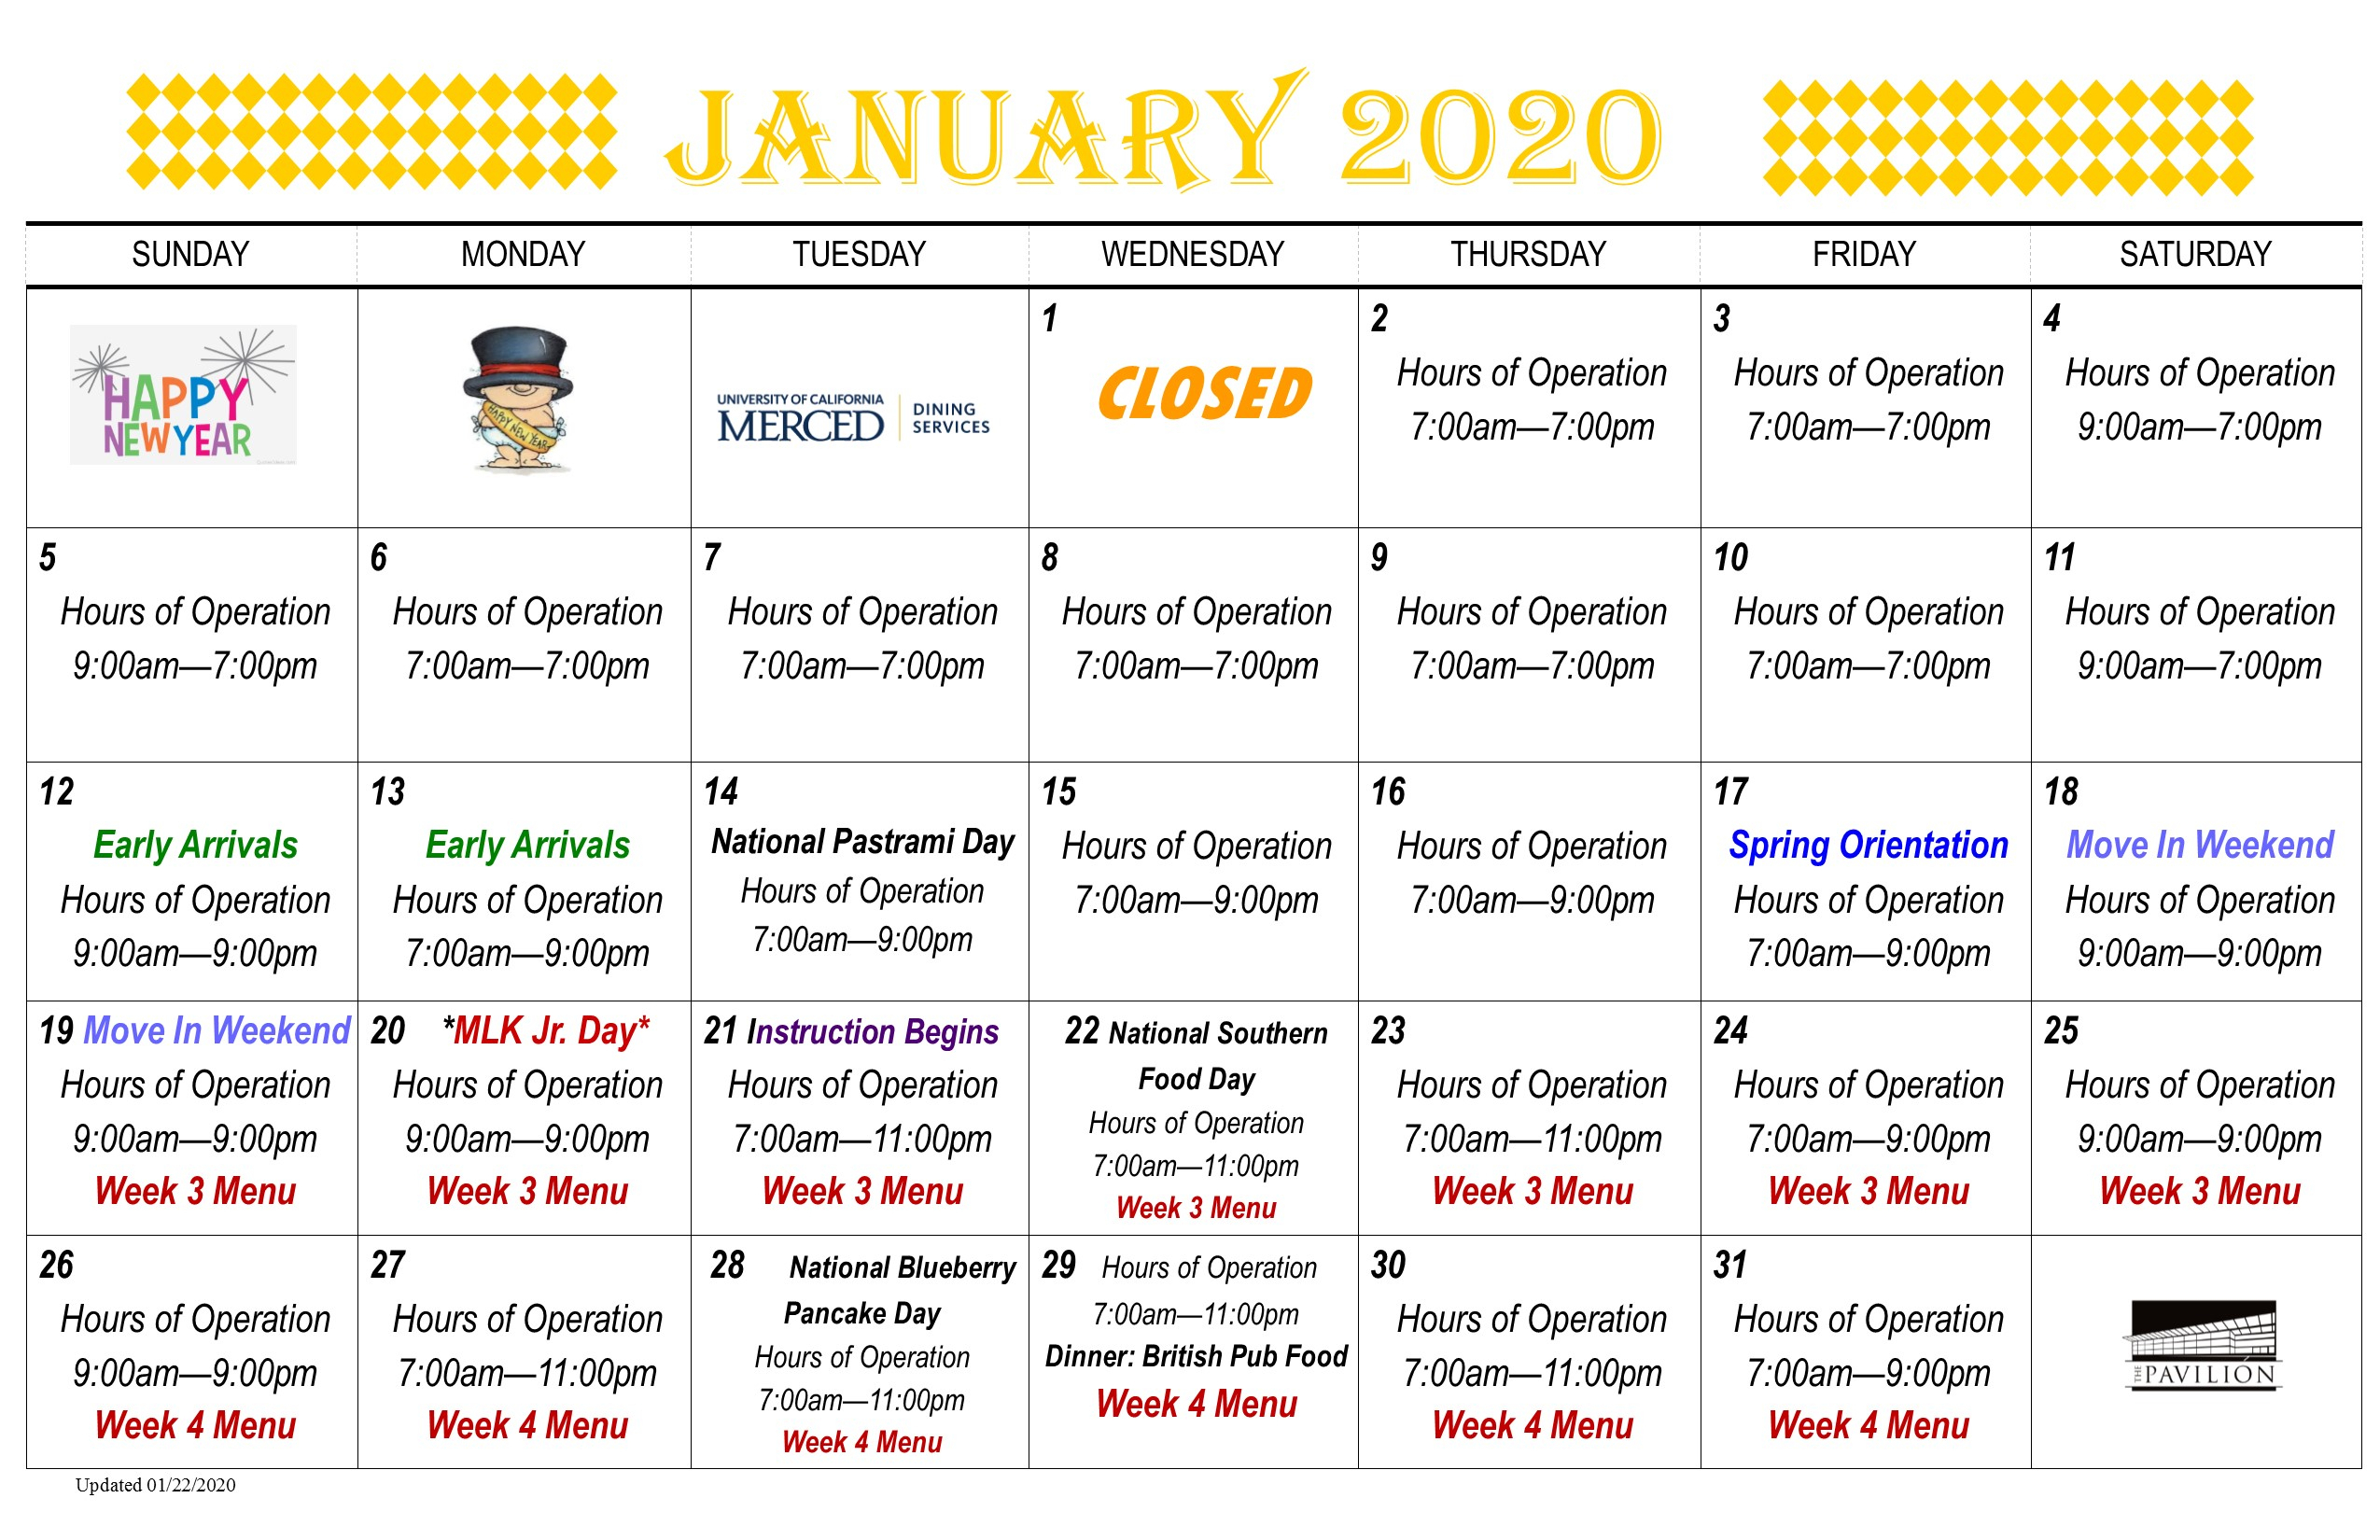 Pavilion Food Calendar | Dining Services